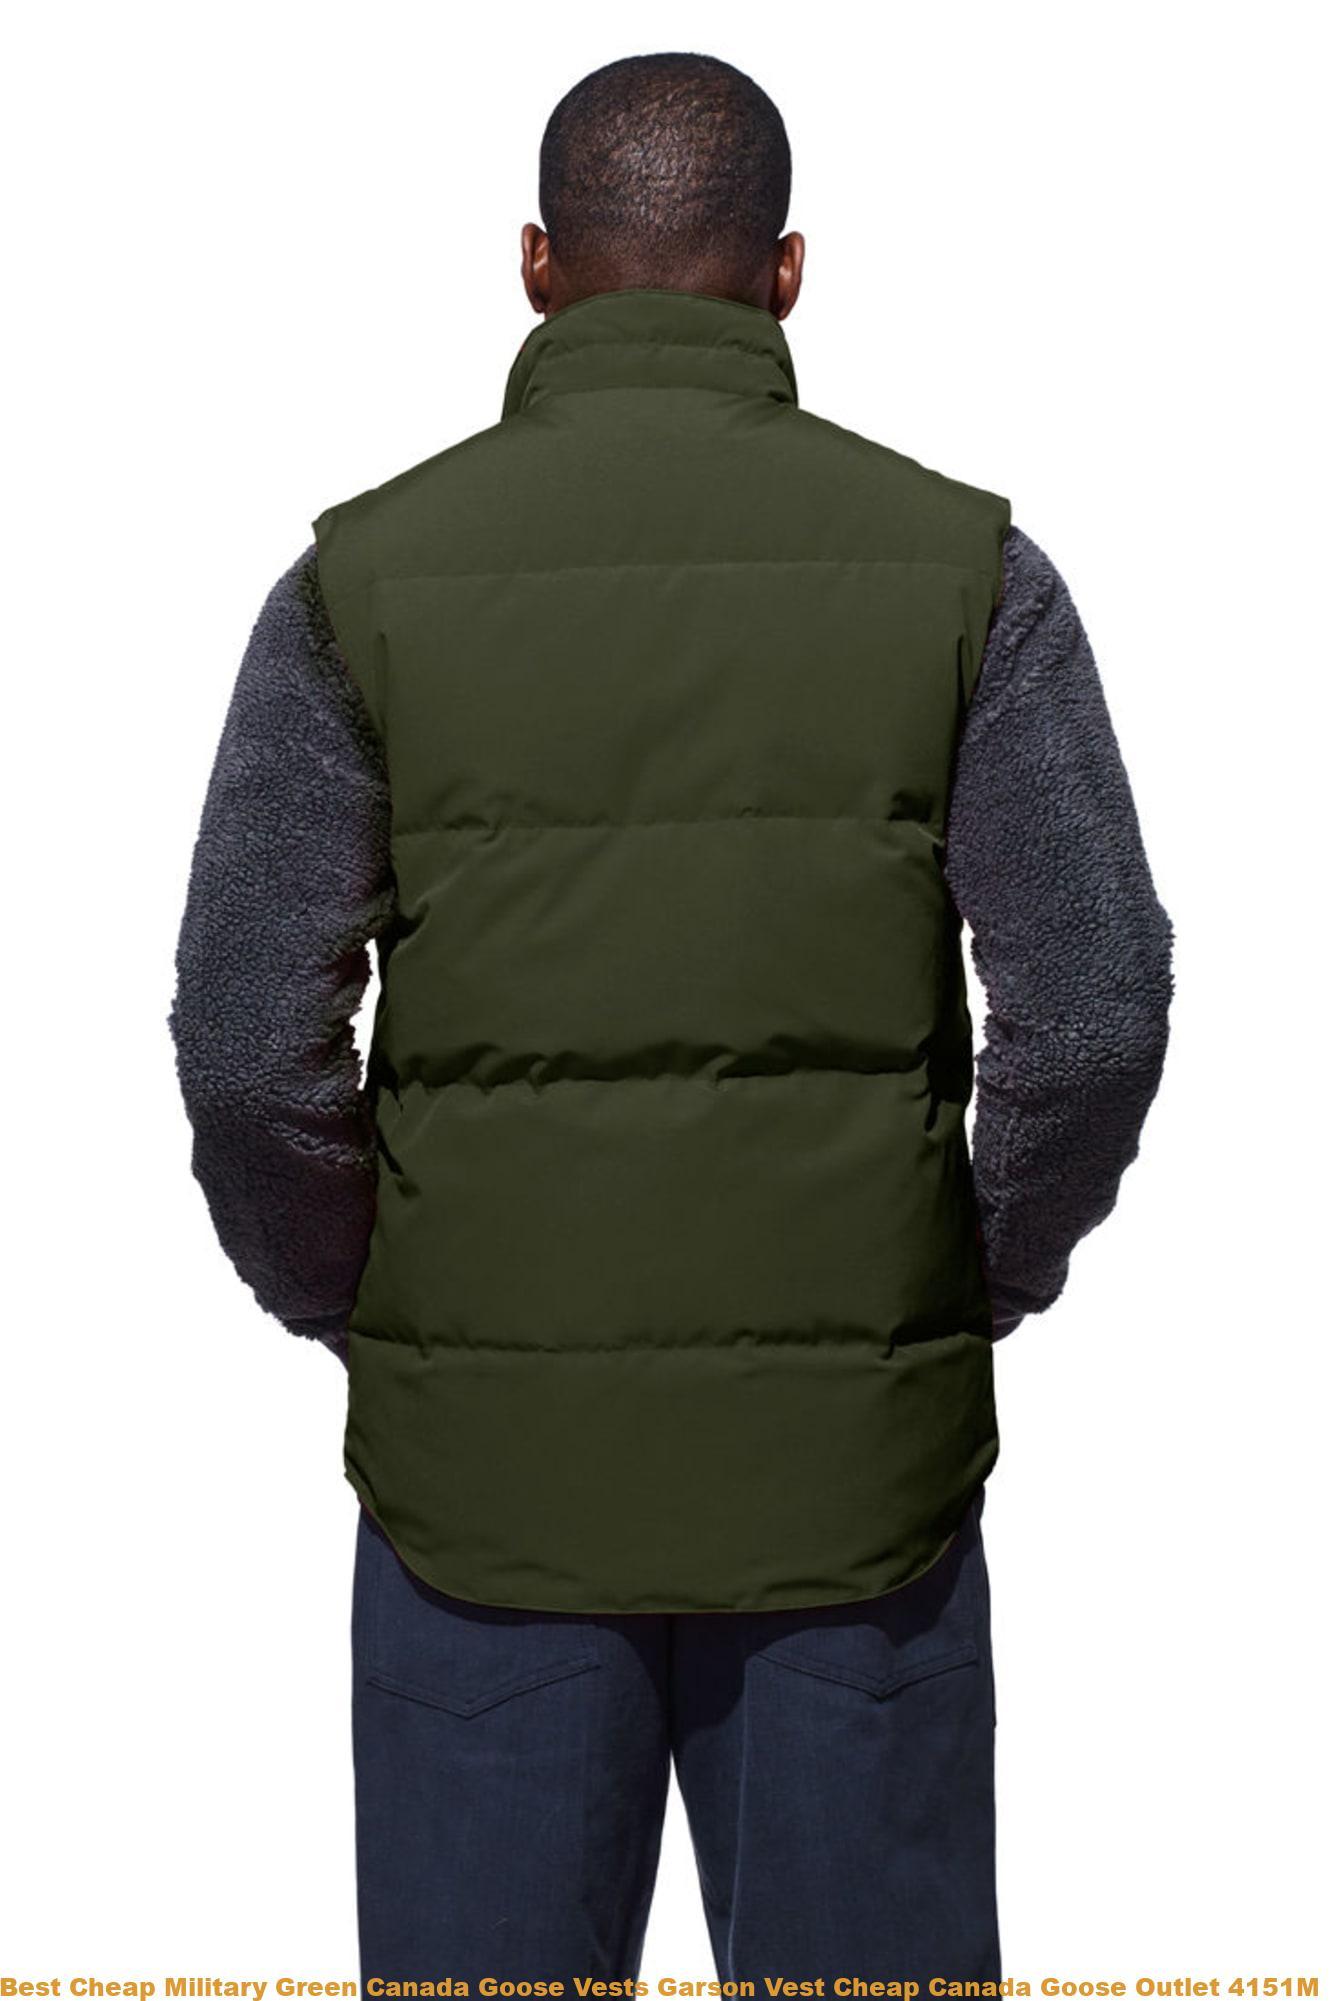 d8e936f4e Best Cheap Military Green Canada Goose Vests Garson Vest Cheap Canada Goose  Outlet 4151M